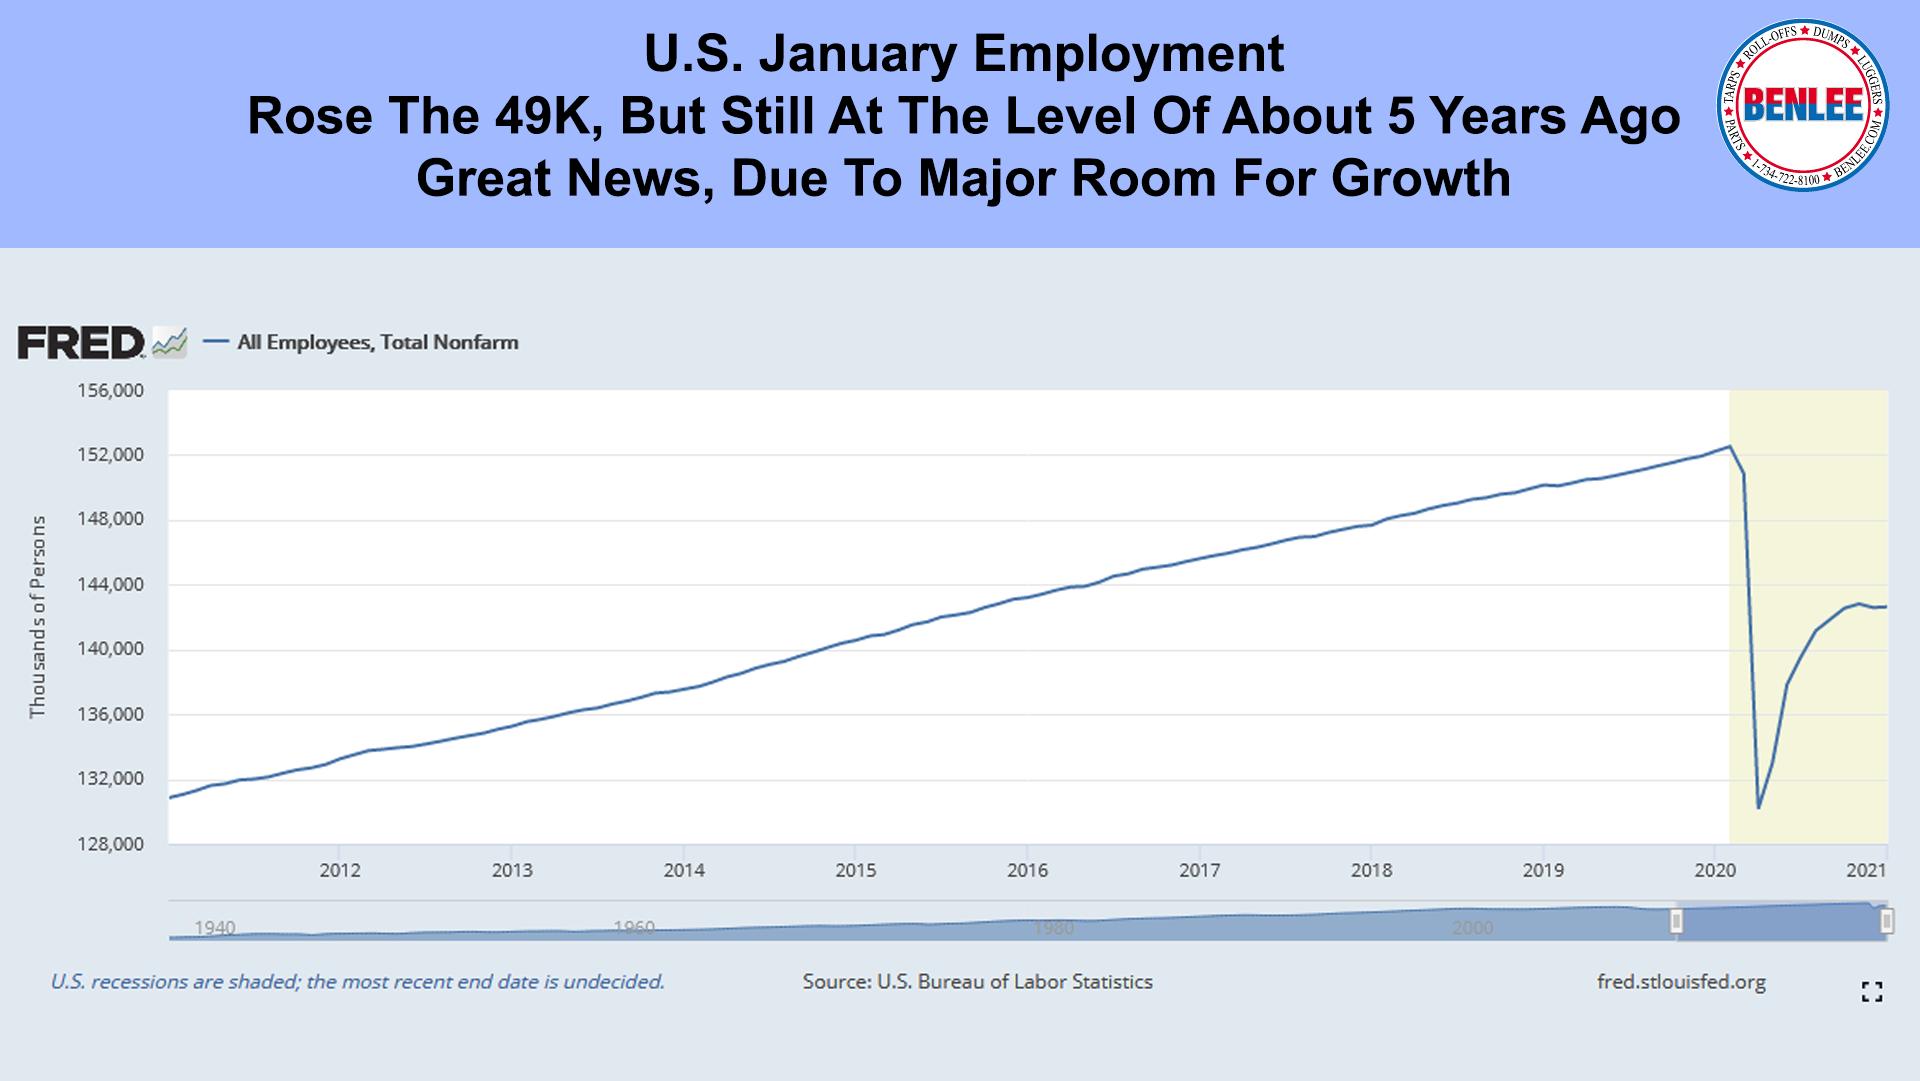 U.S. January Employment